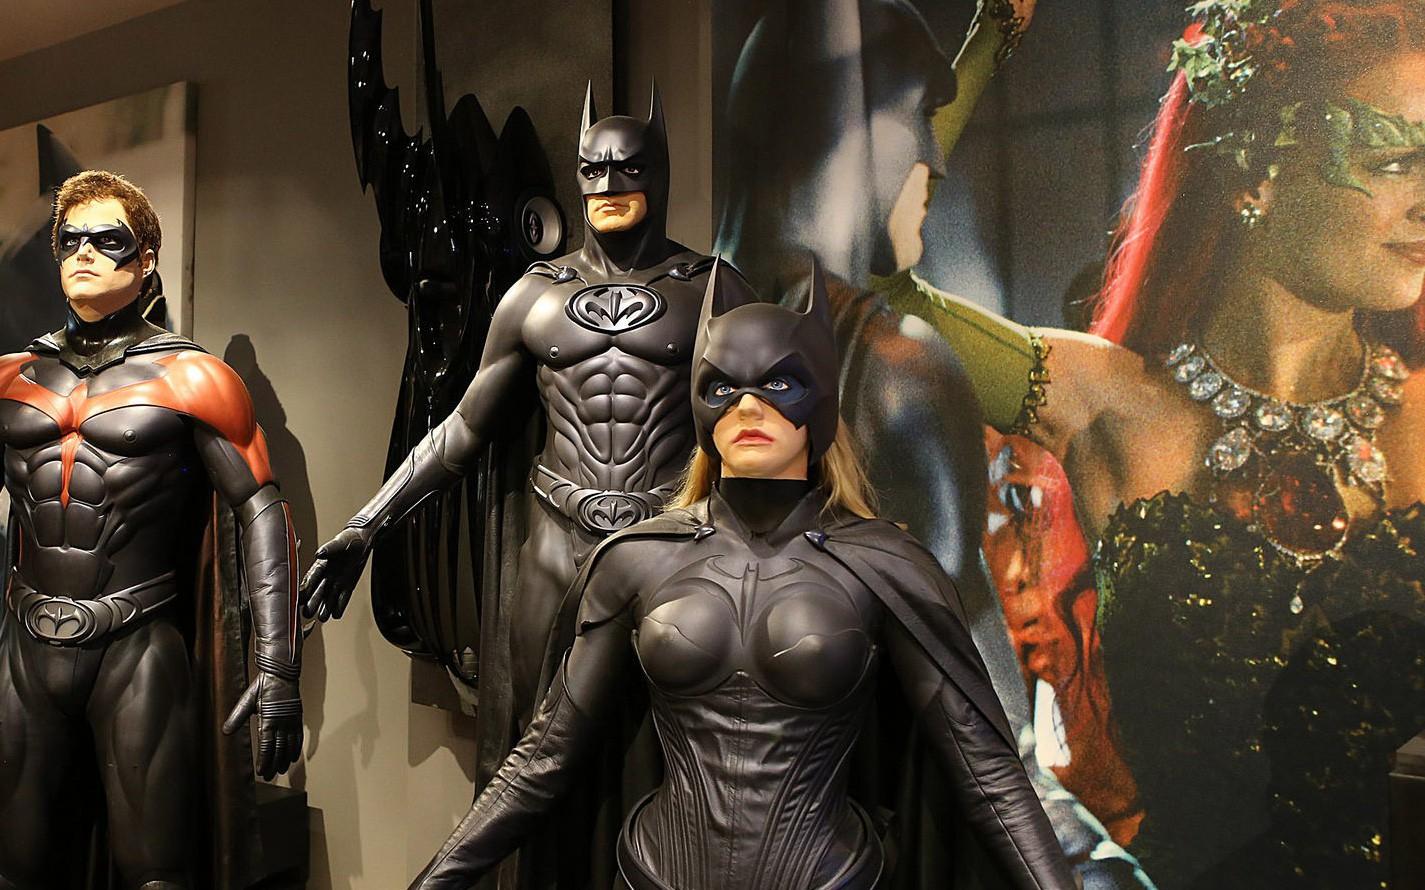 Thăm phim trường Hãng Warner Bros: khám phá 'bí mật' Hollywood